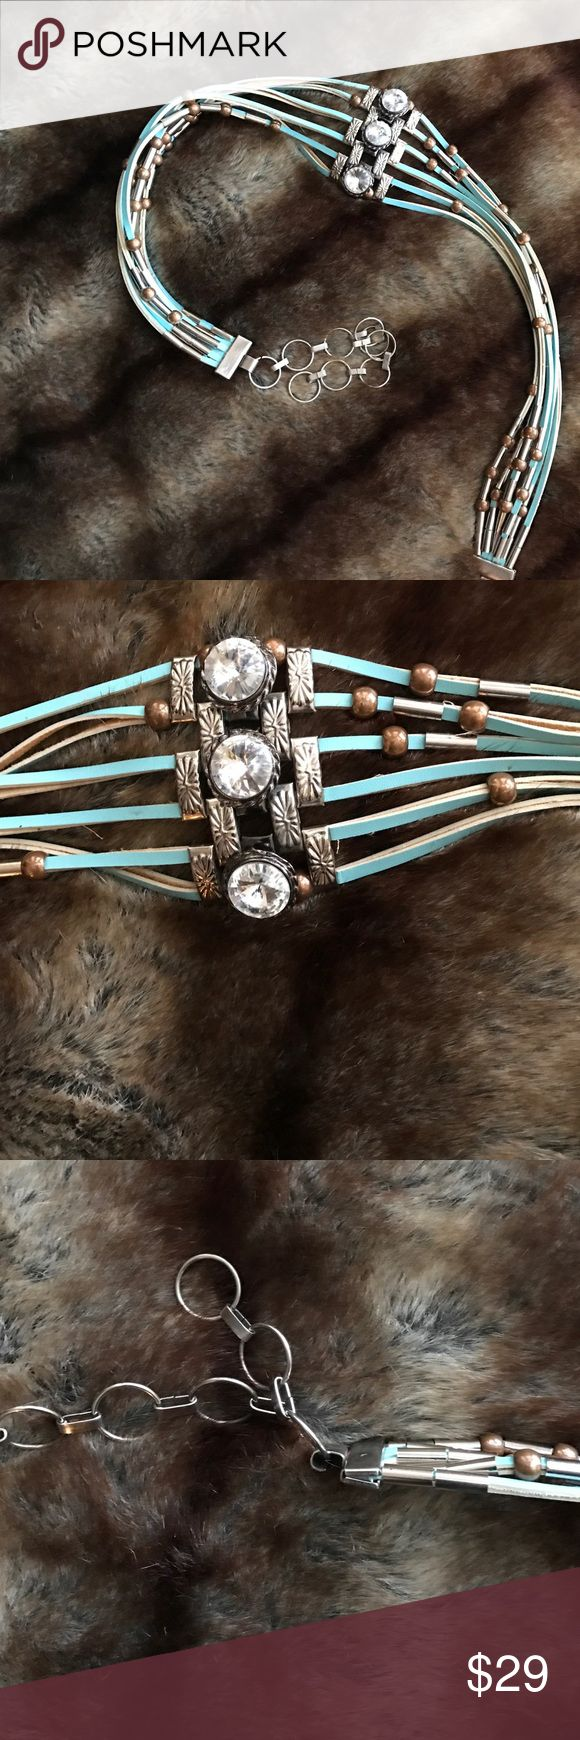 "Gorgeous boho leather belt Gorgeous boho leather belt, 38 1/2"" long, including extender, pja0 Accessories Belts"